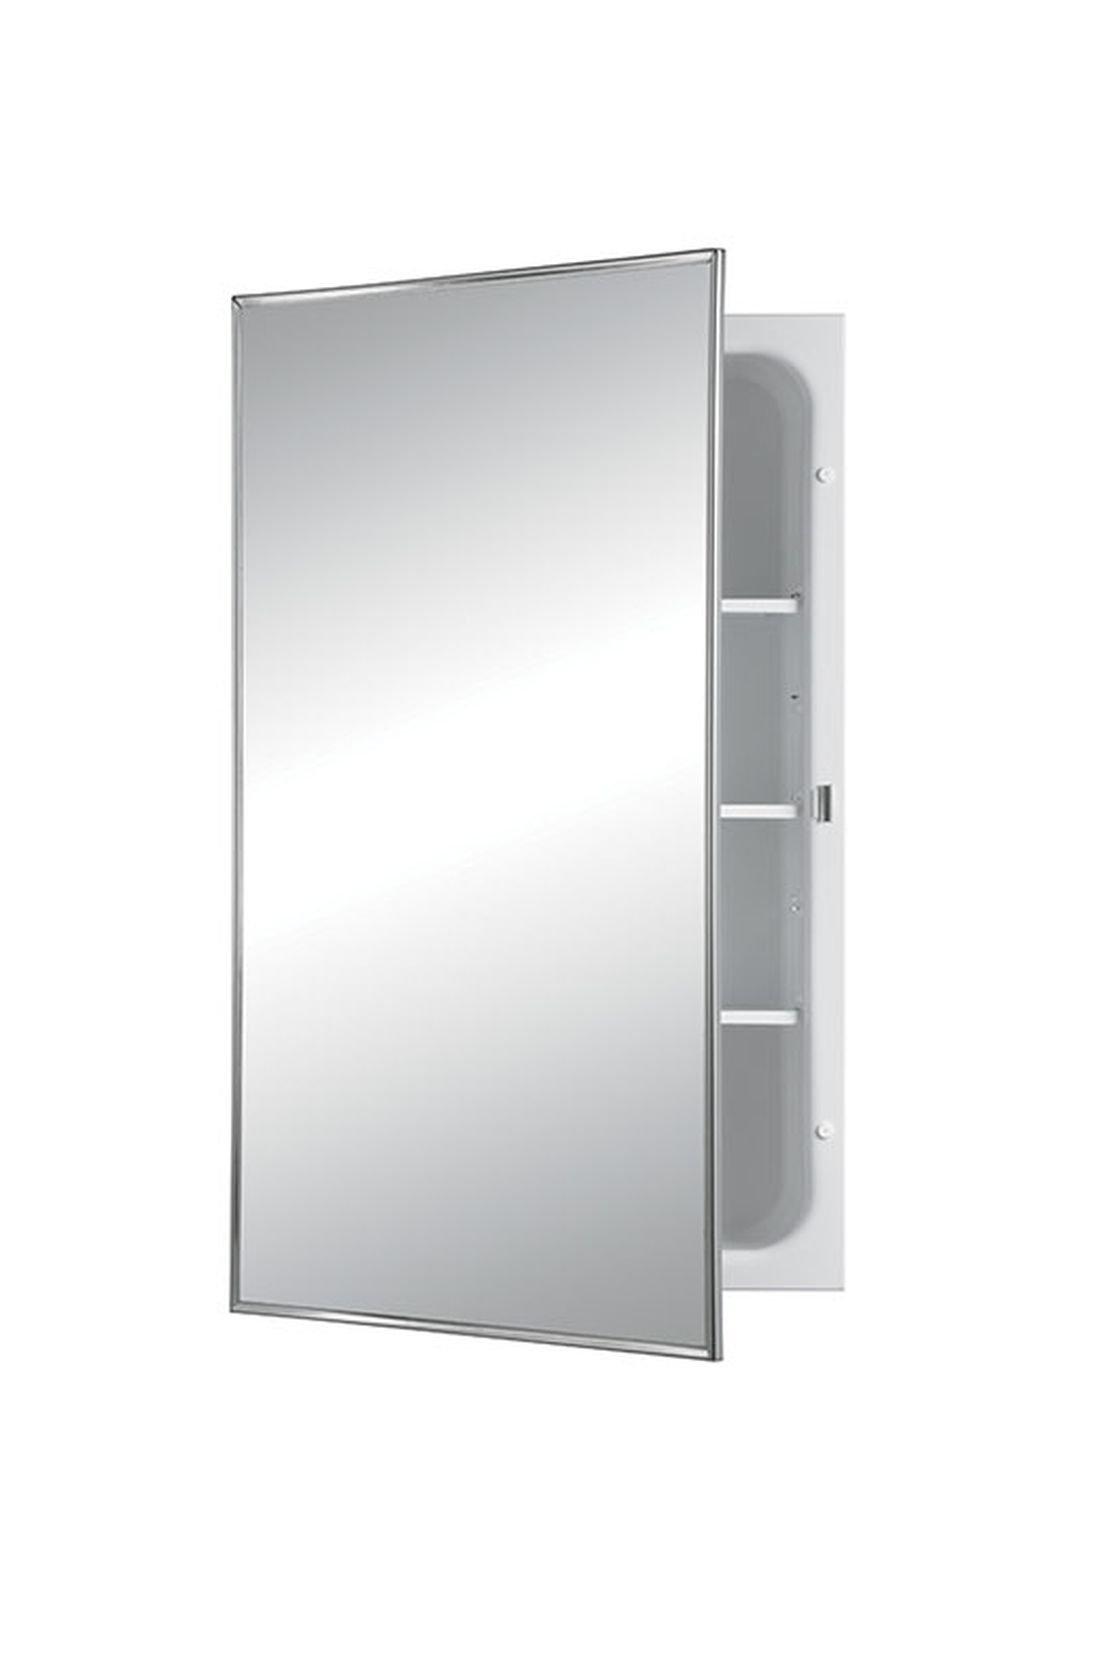 Jensen 468BCX Stainless Steel Frame Medicine Cabinet, 16'' x 26''